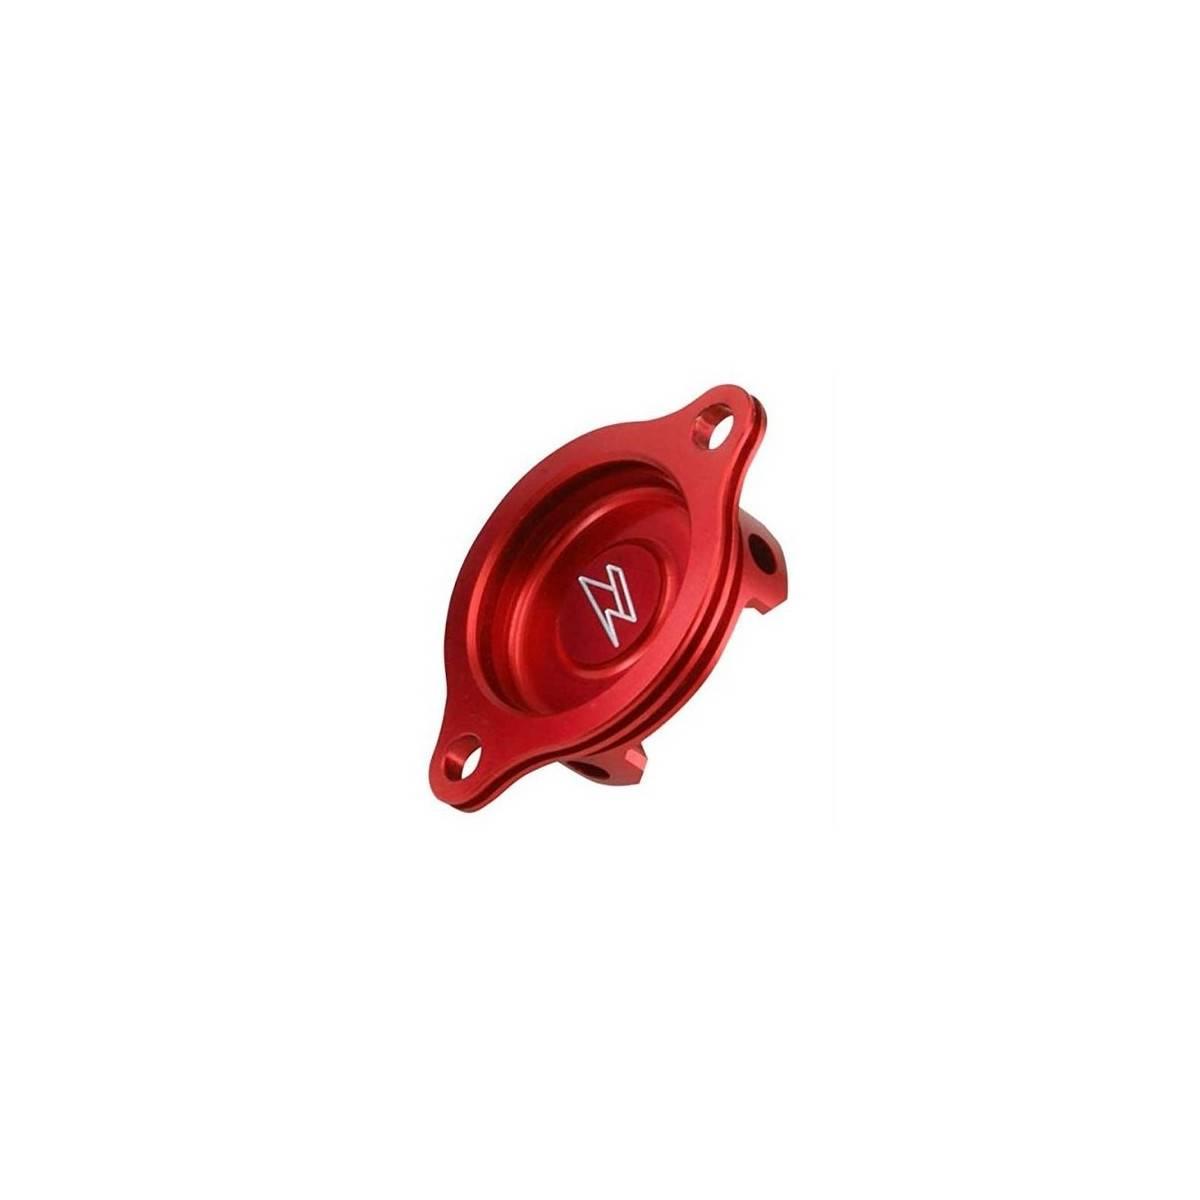 ZE90.1073 - Tapa Filtro Aceite Zeta Crf450R X´02-08 Rojo